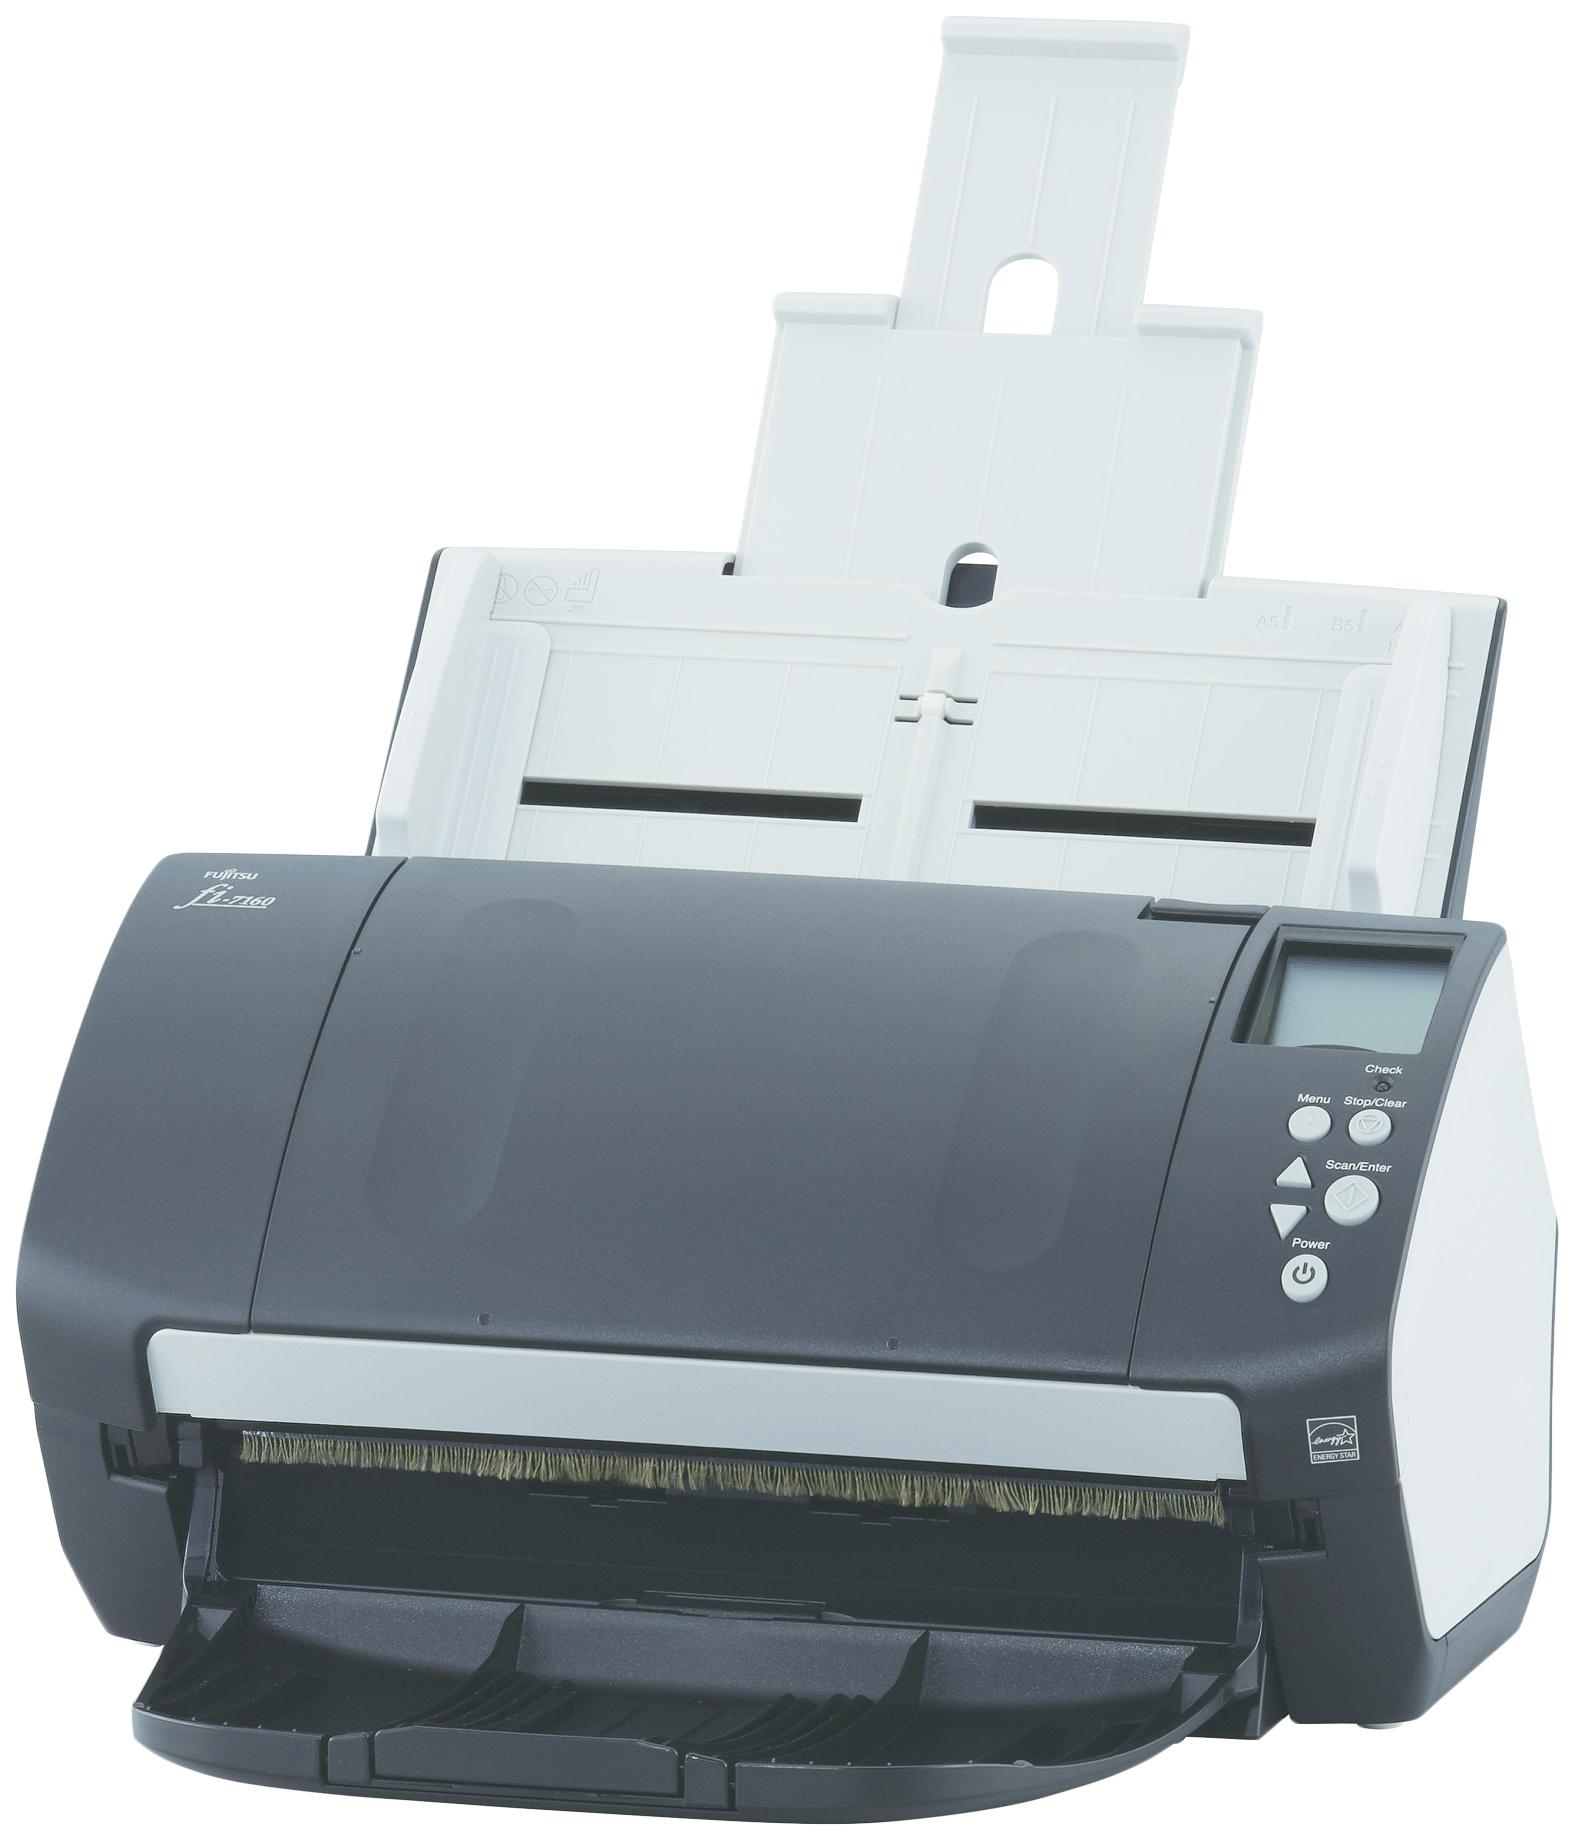 Сканер Fujitsu fi 7160 PA03670 B051 Белый,